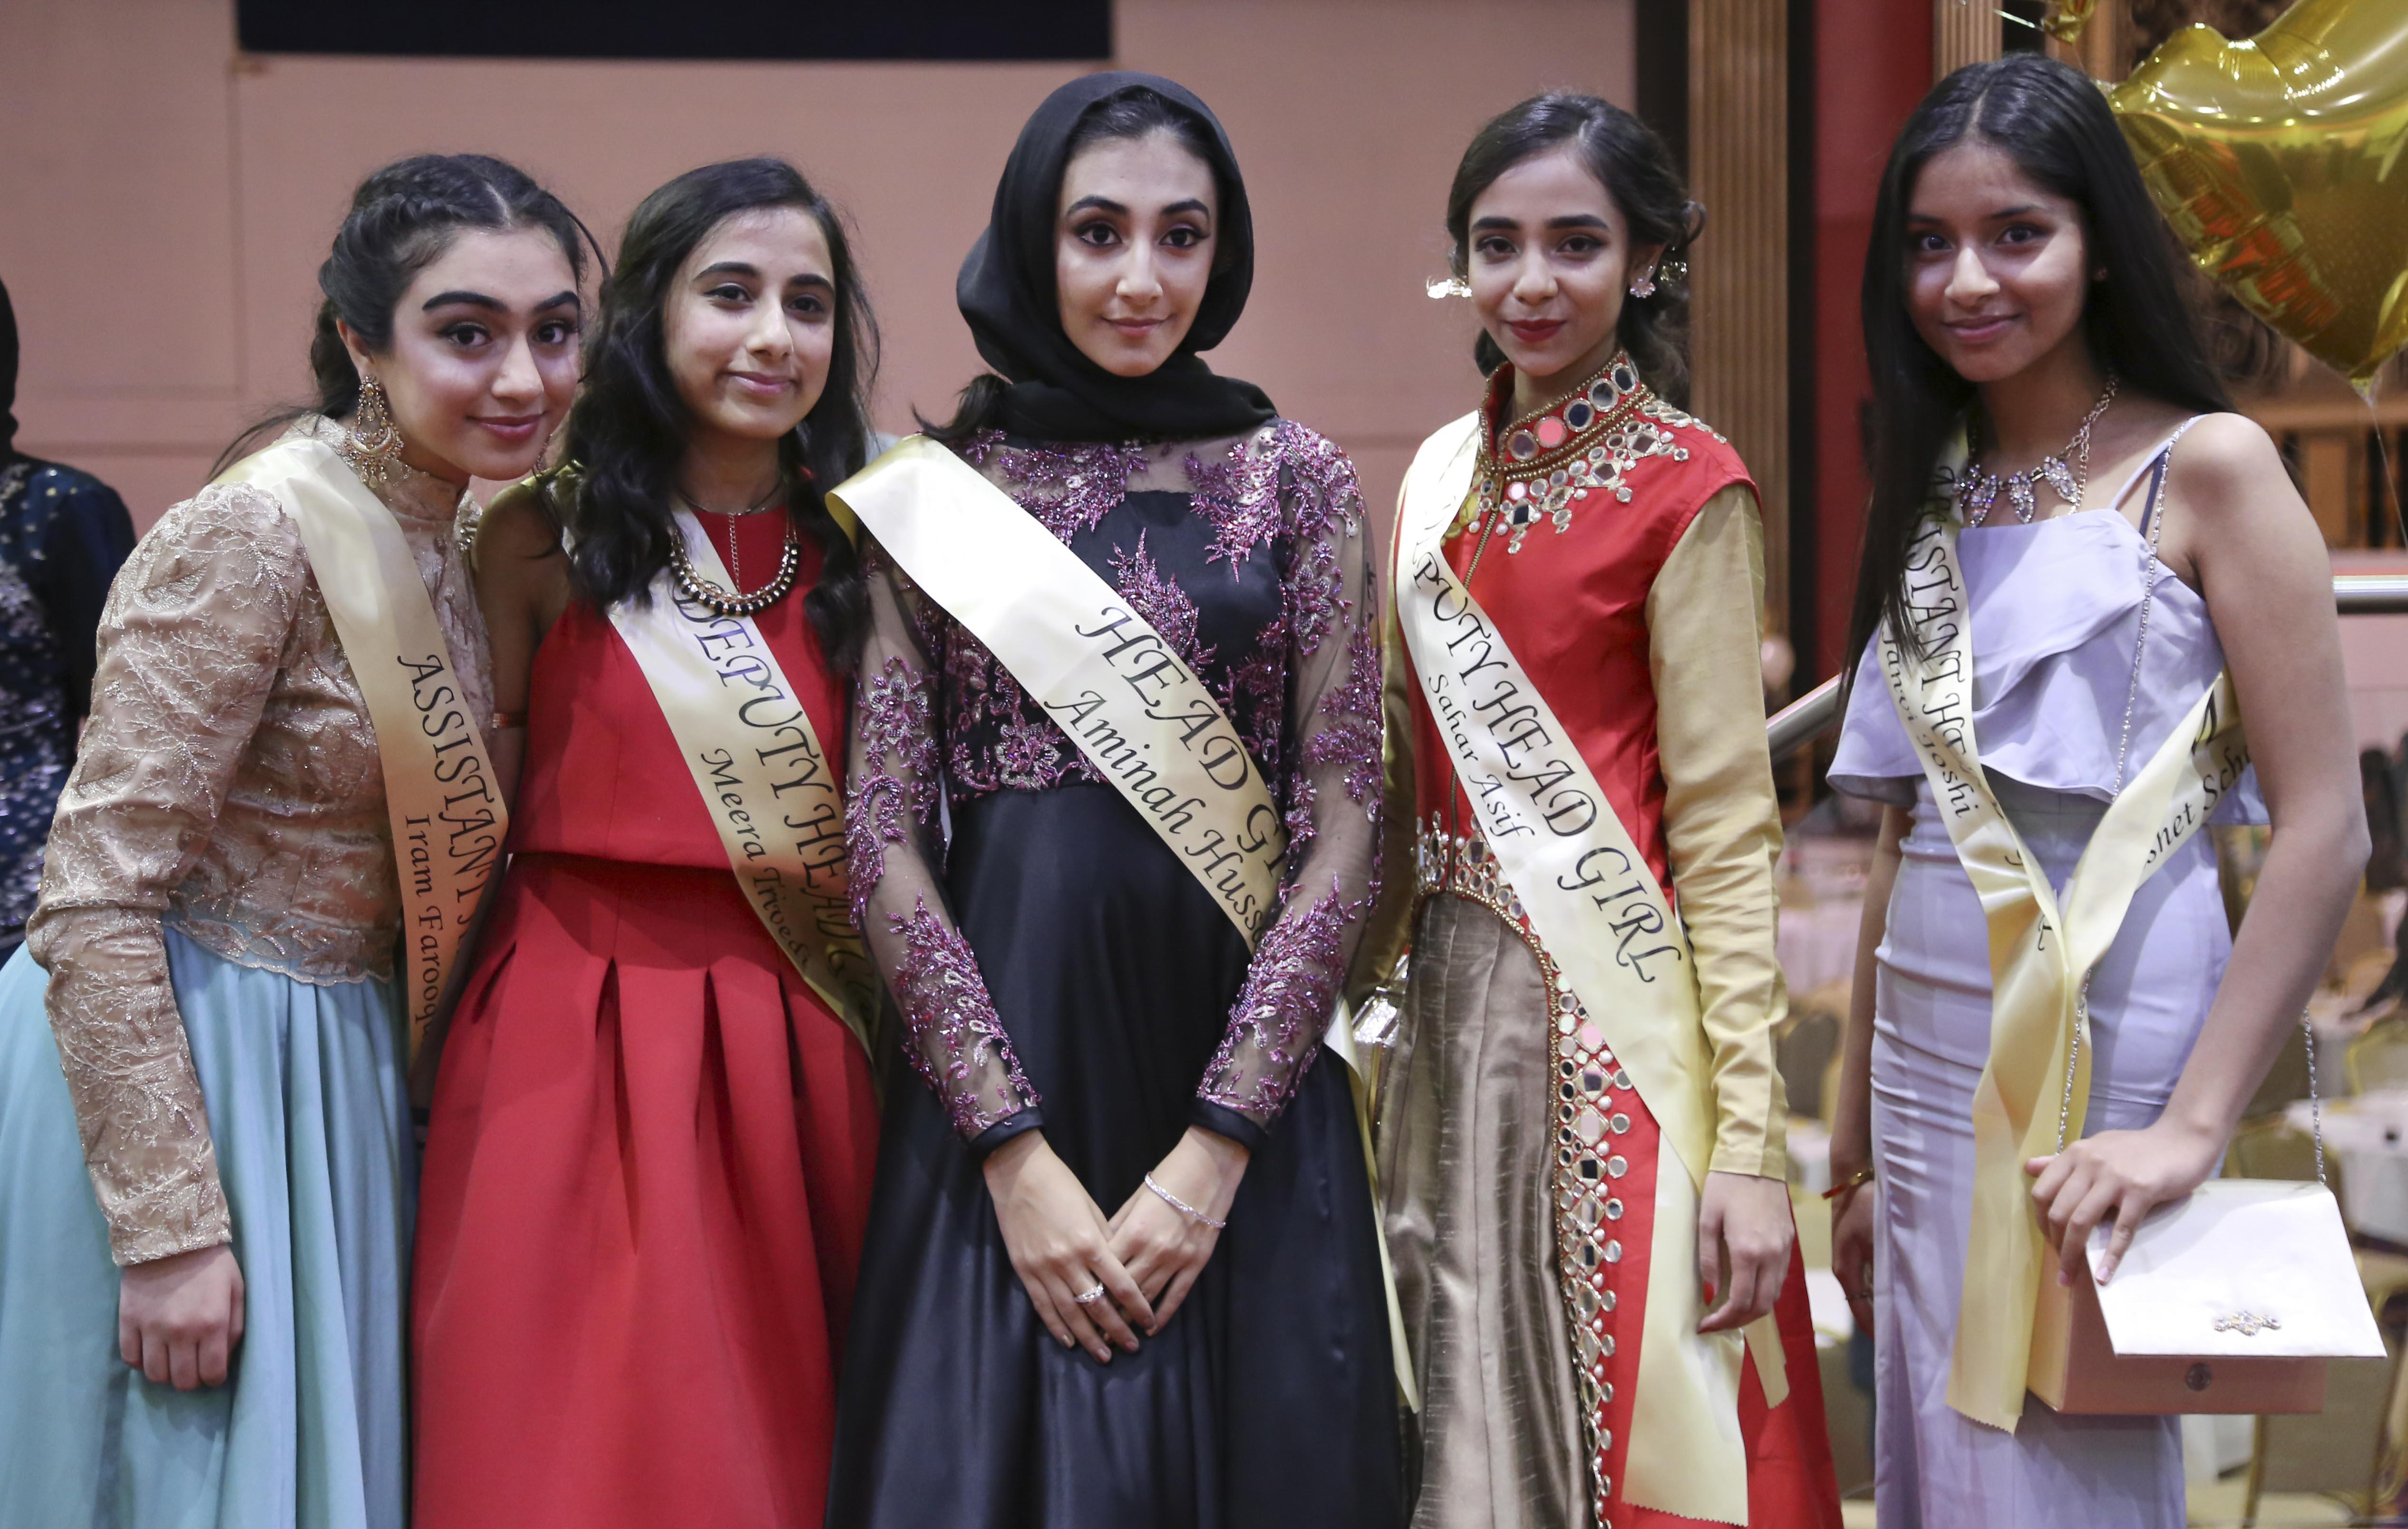 Iram Farooqui 11P, Meera Trivedi 11N, Aminah Hussan 11P, Sahar Asif 11N and Janvi Joshi 11P 2-edit